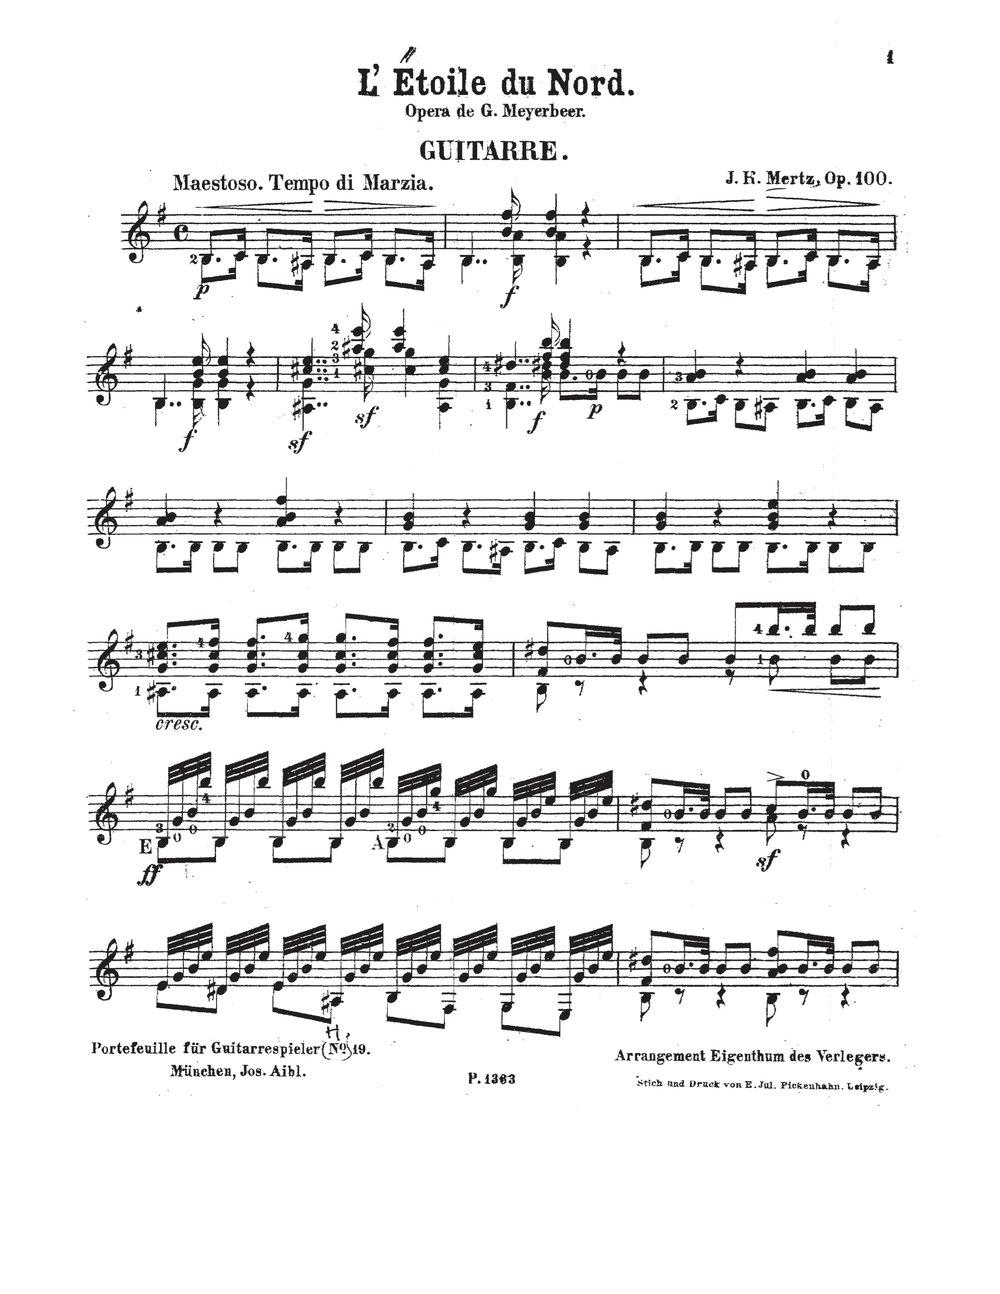 L'Étoile du Nord, Op.100 (Mertz, Johann Kaspar) 1.jpg